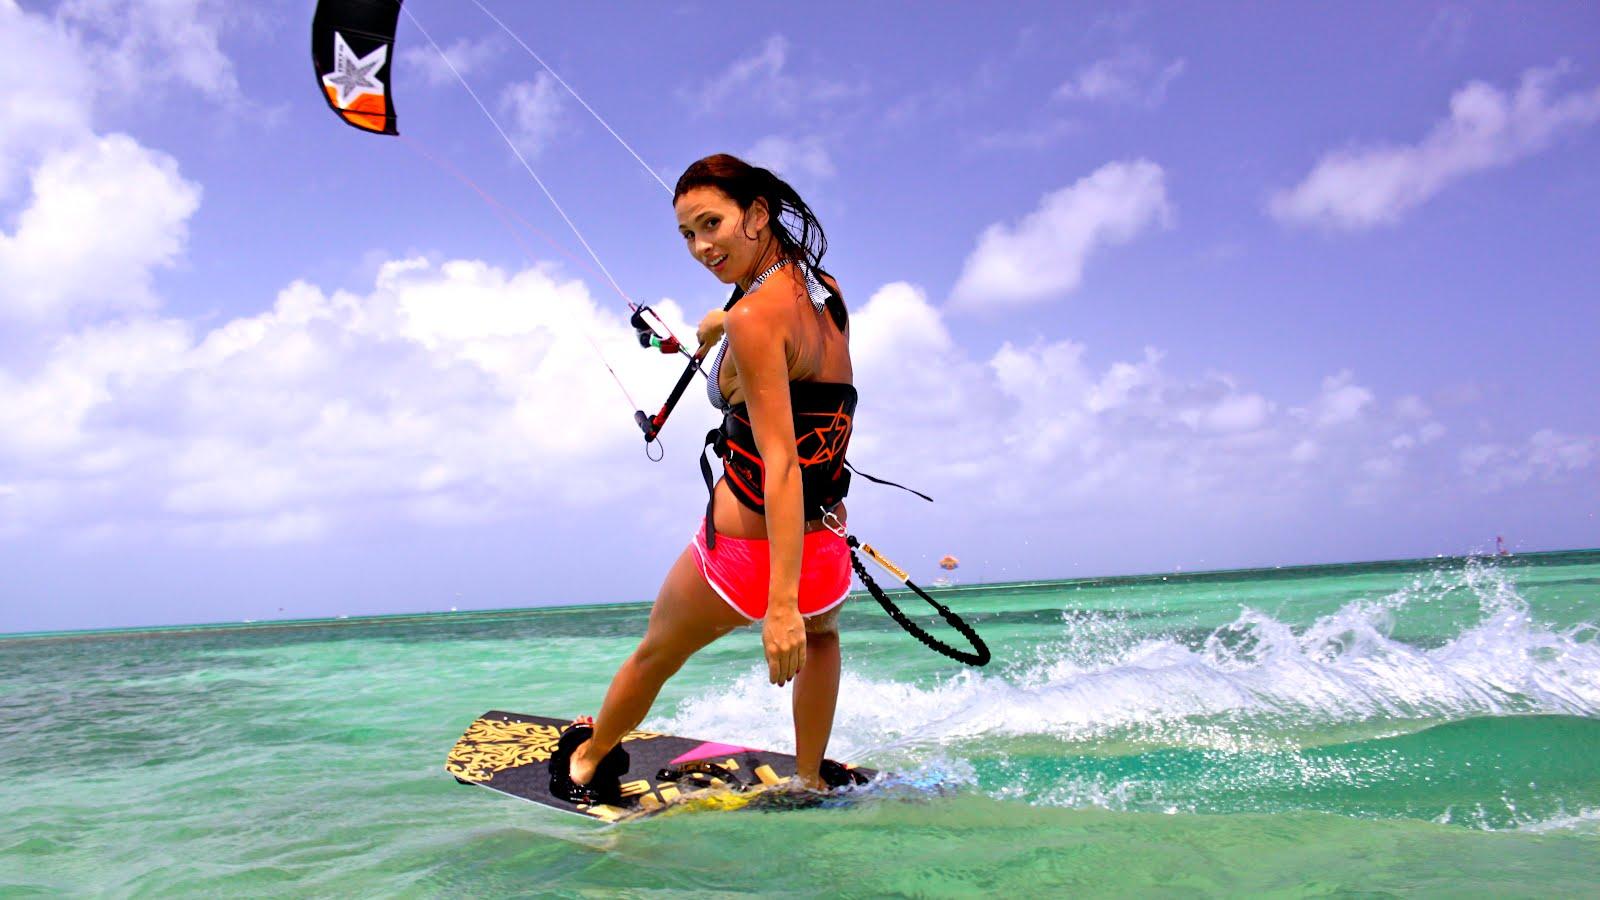 kitesurf chica